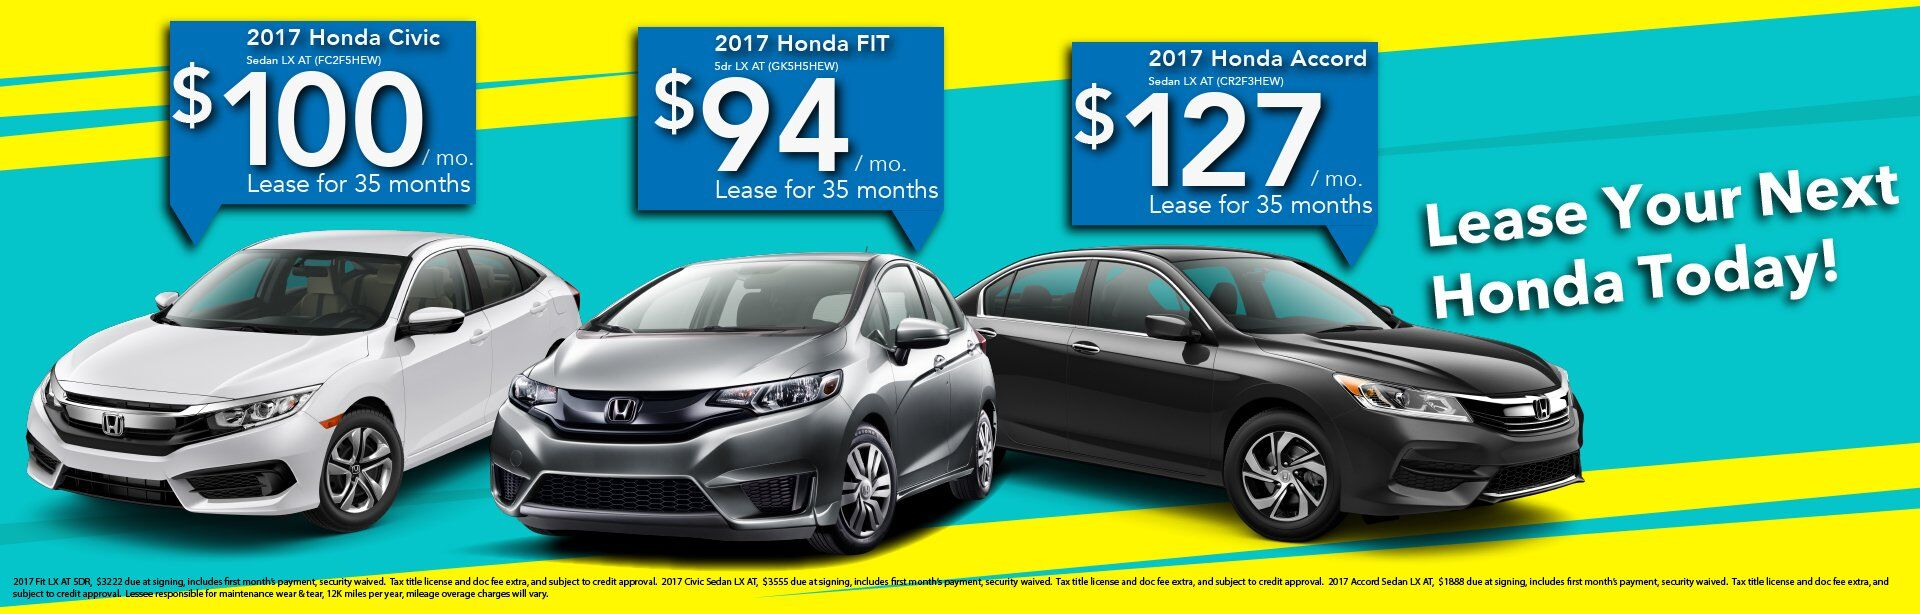 Honda Fit Lease